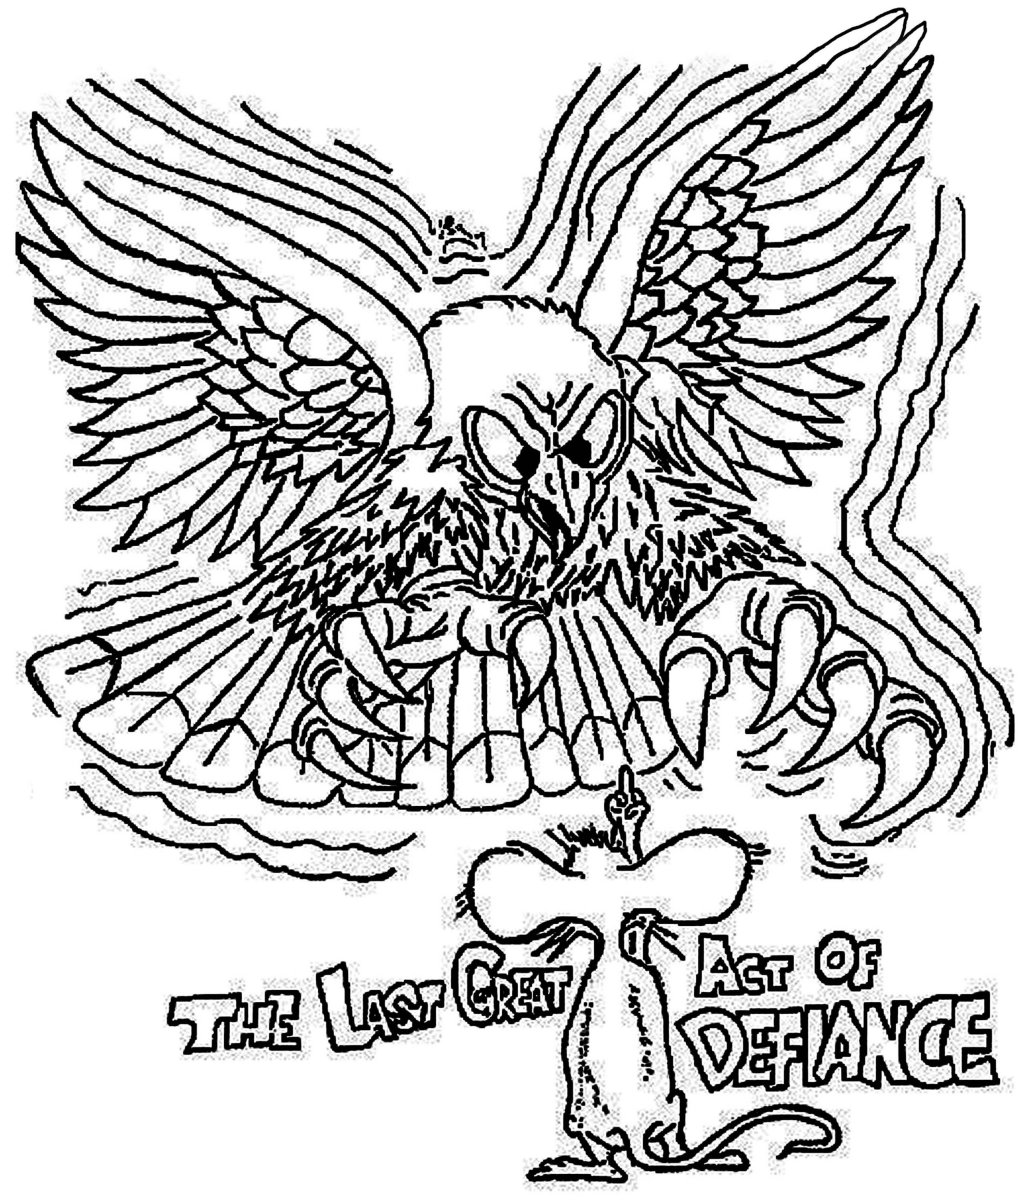 2011-Defiance T-shirt-Black-White-14X12.jpg